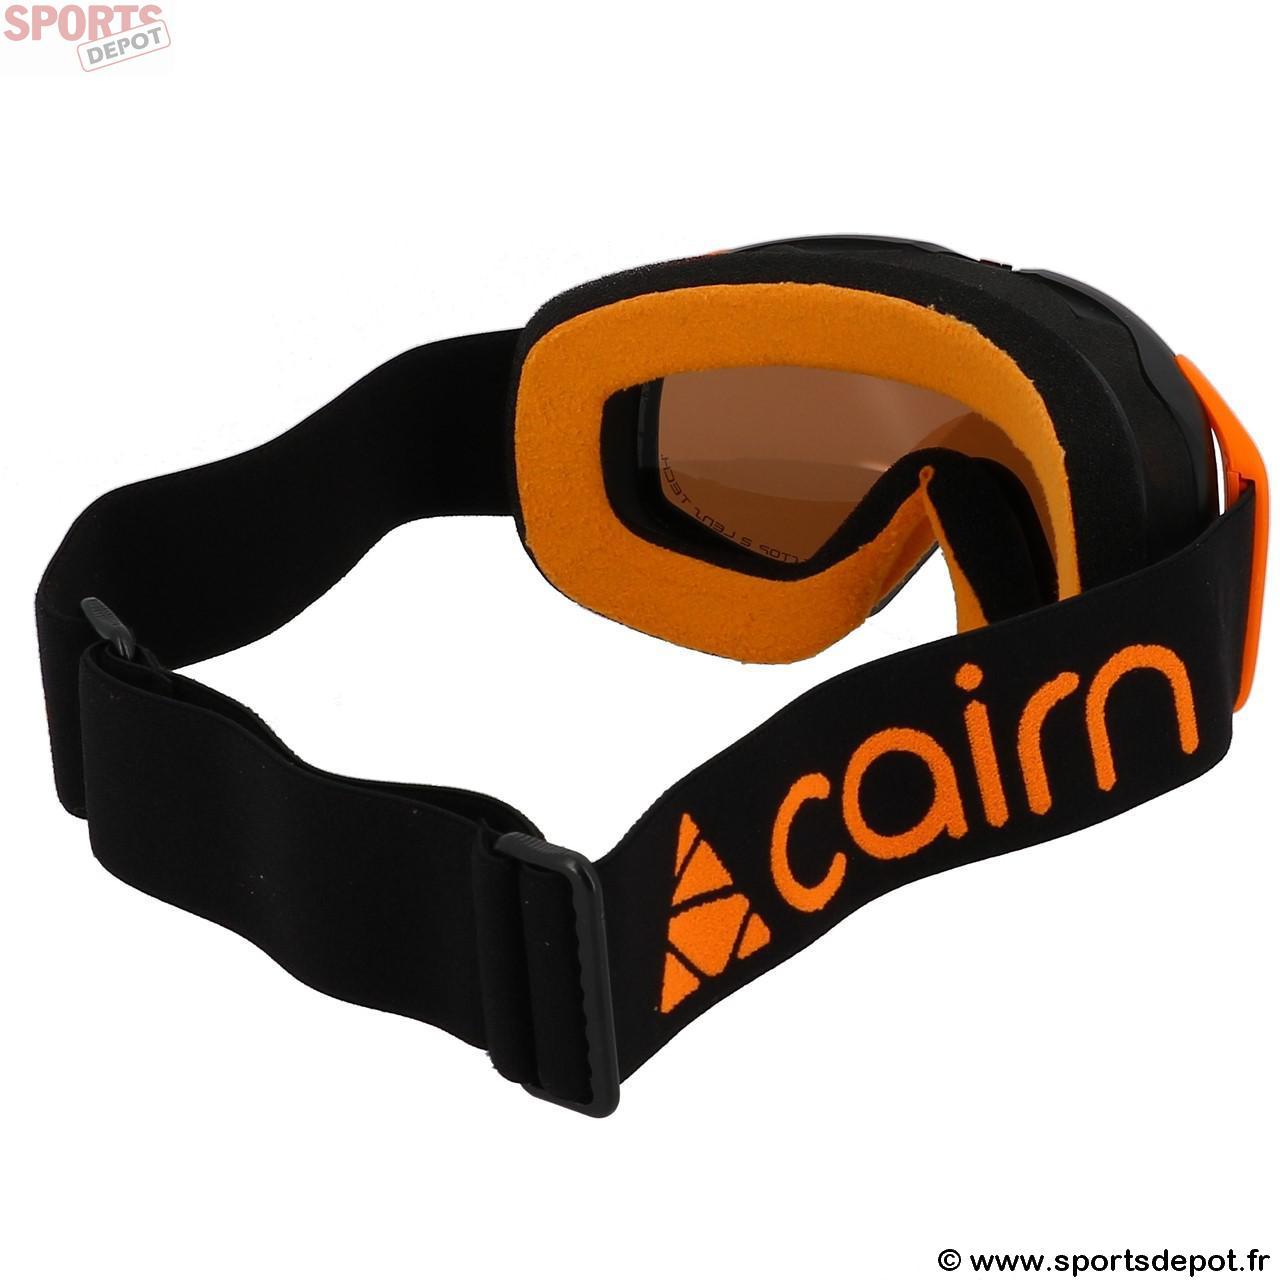 acheter masque de ski double cran cairn booster de nr irium 06 12 enfant junior comparer. Black Bedroom Furniture Sets. Home Design Ideas